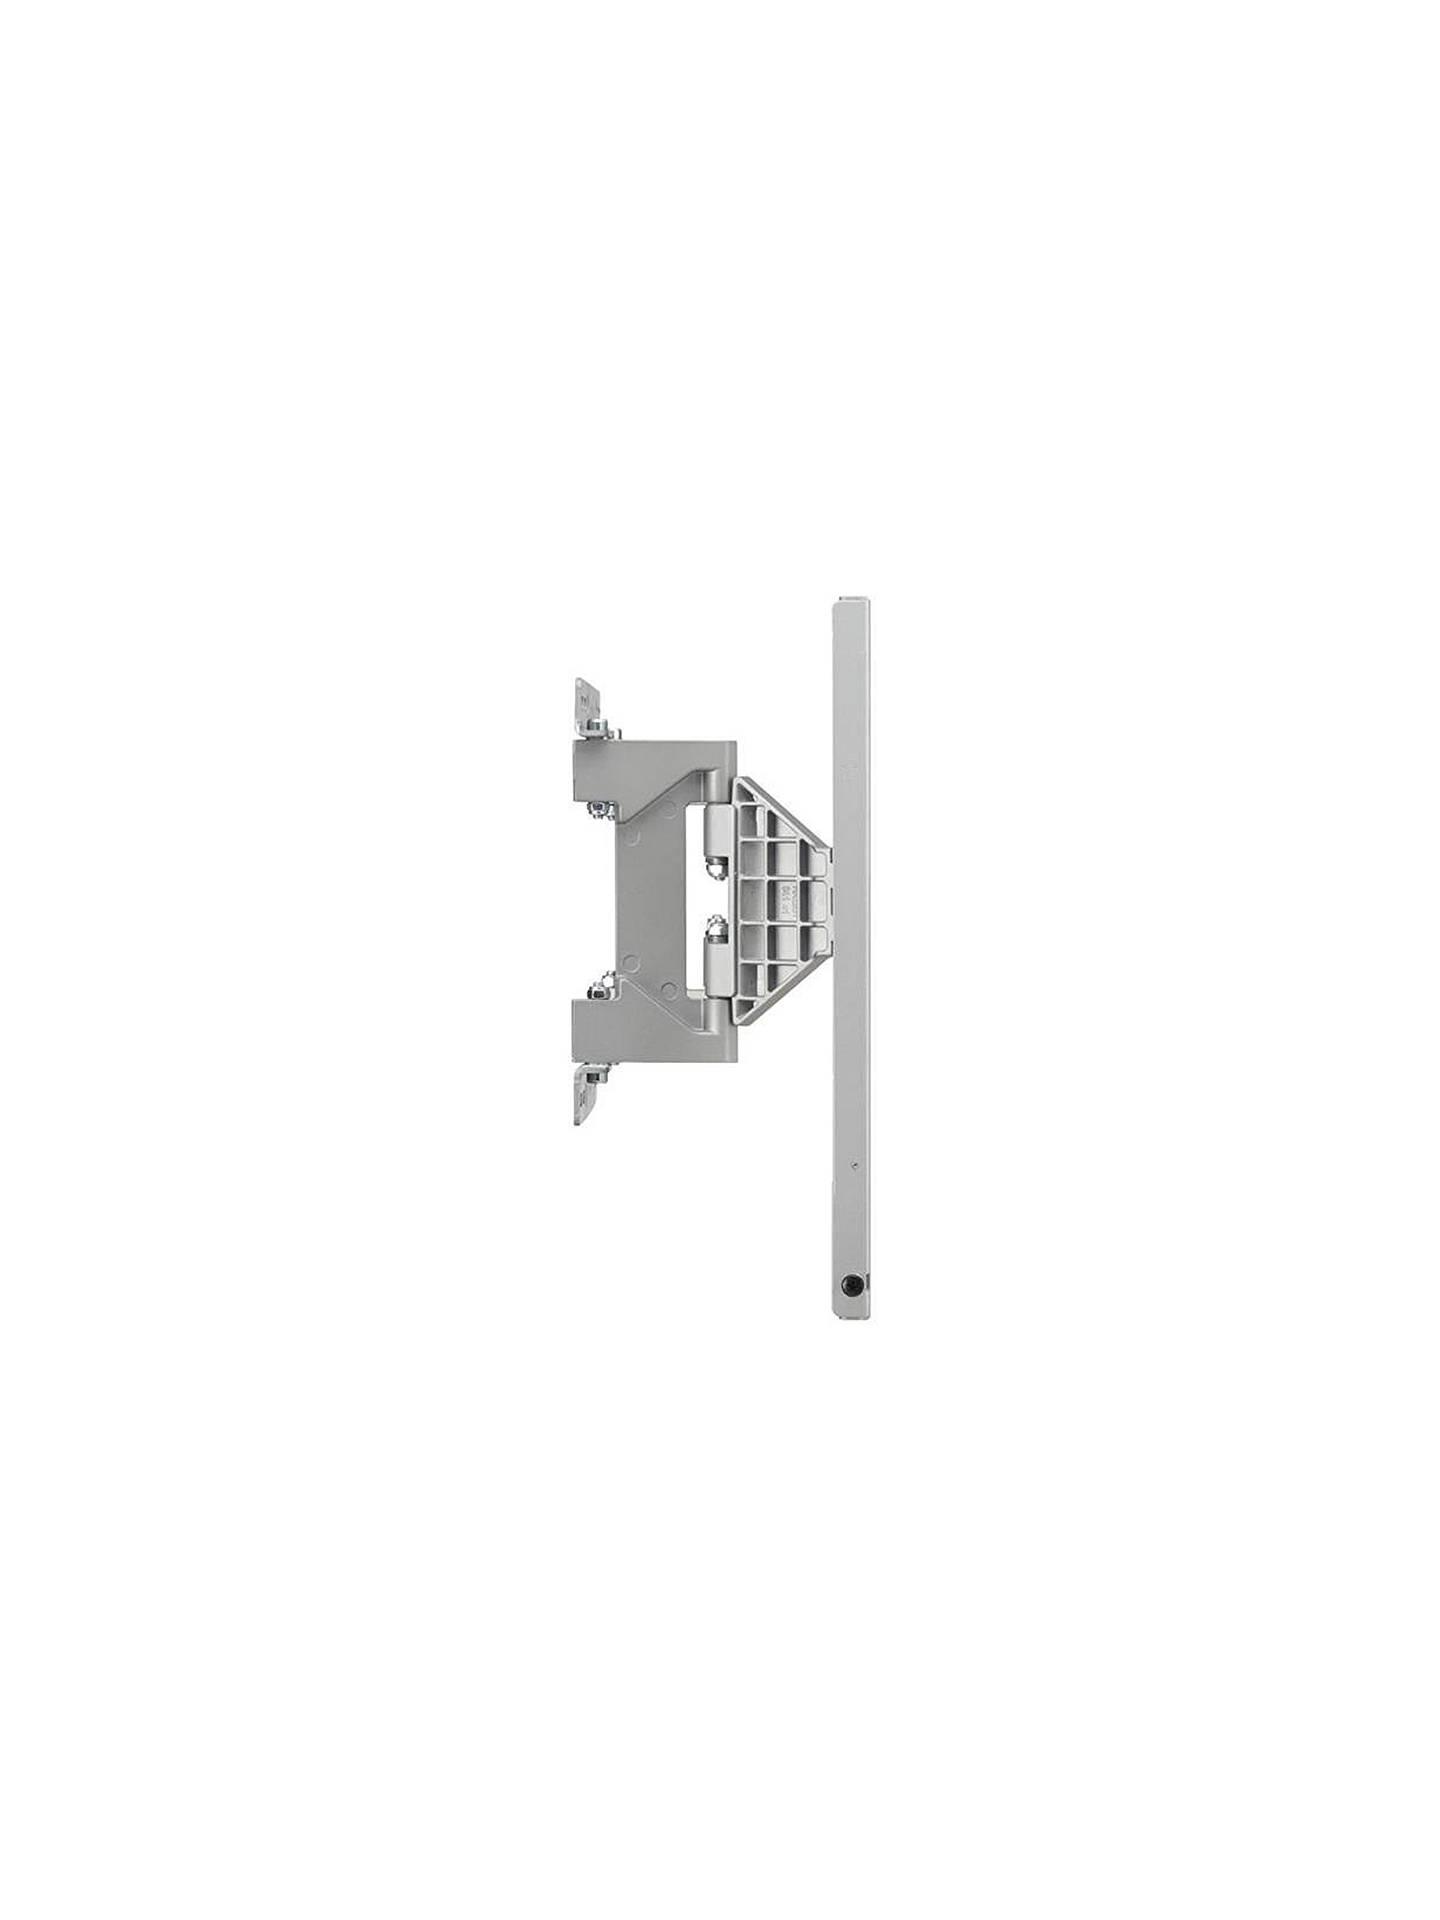 Lg Otw420b Tilt Amp Turn Tv Wall Mount For B6 C6 E6 G6